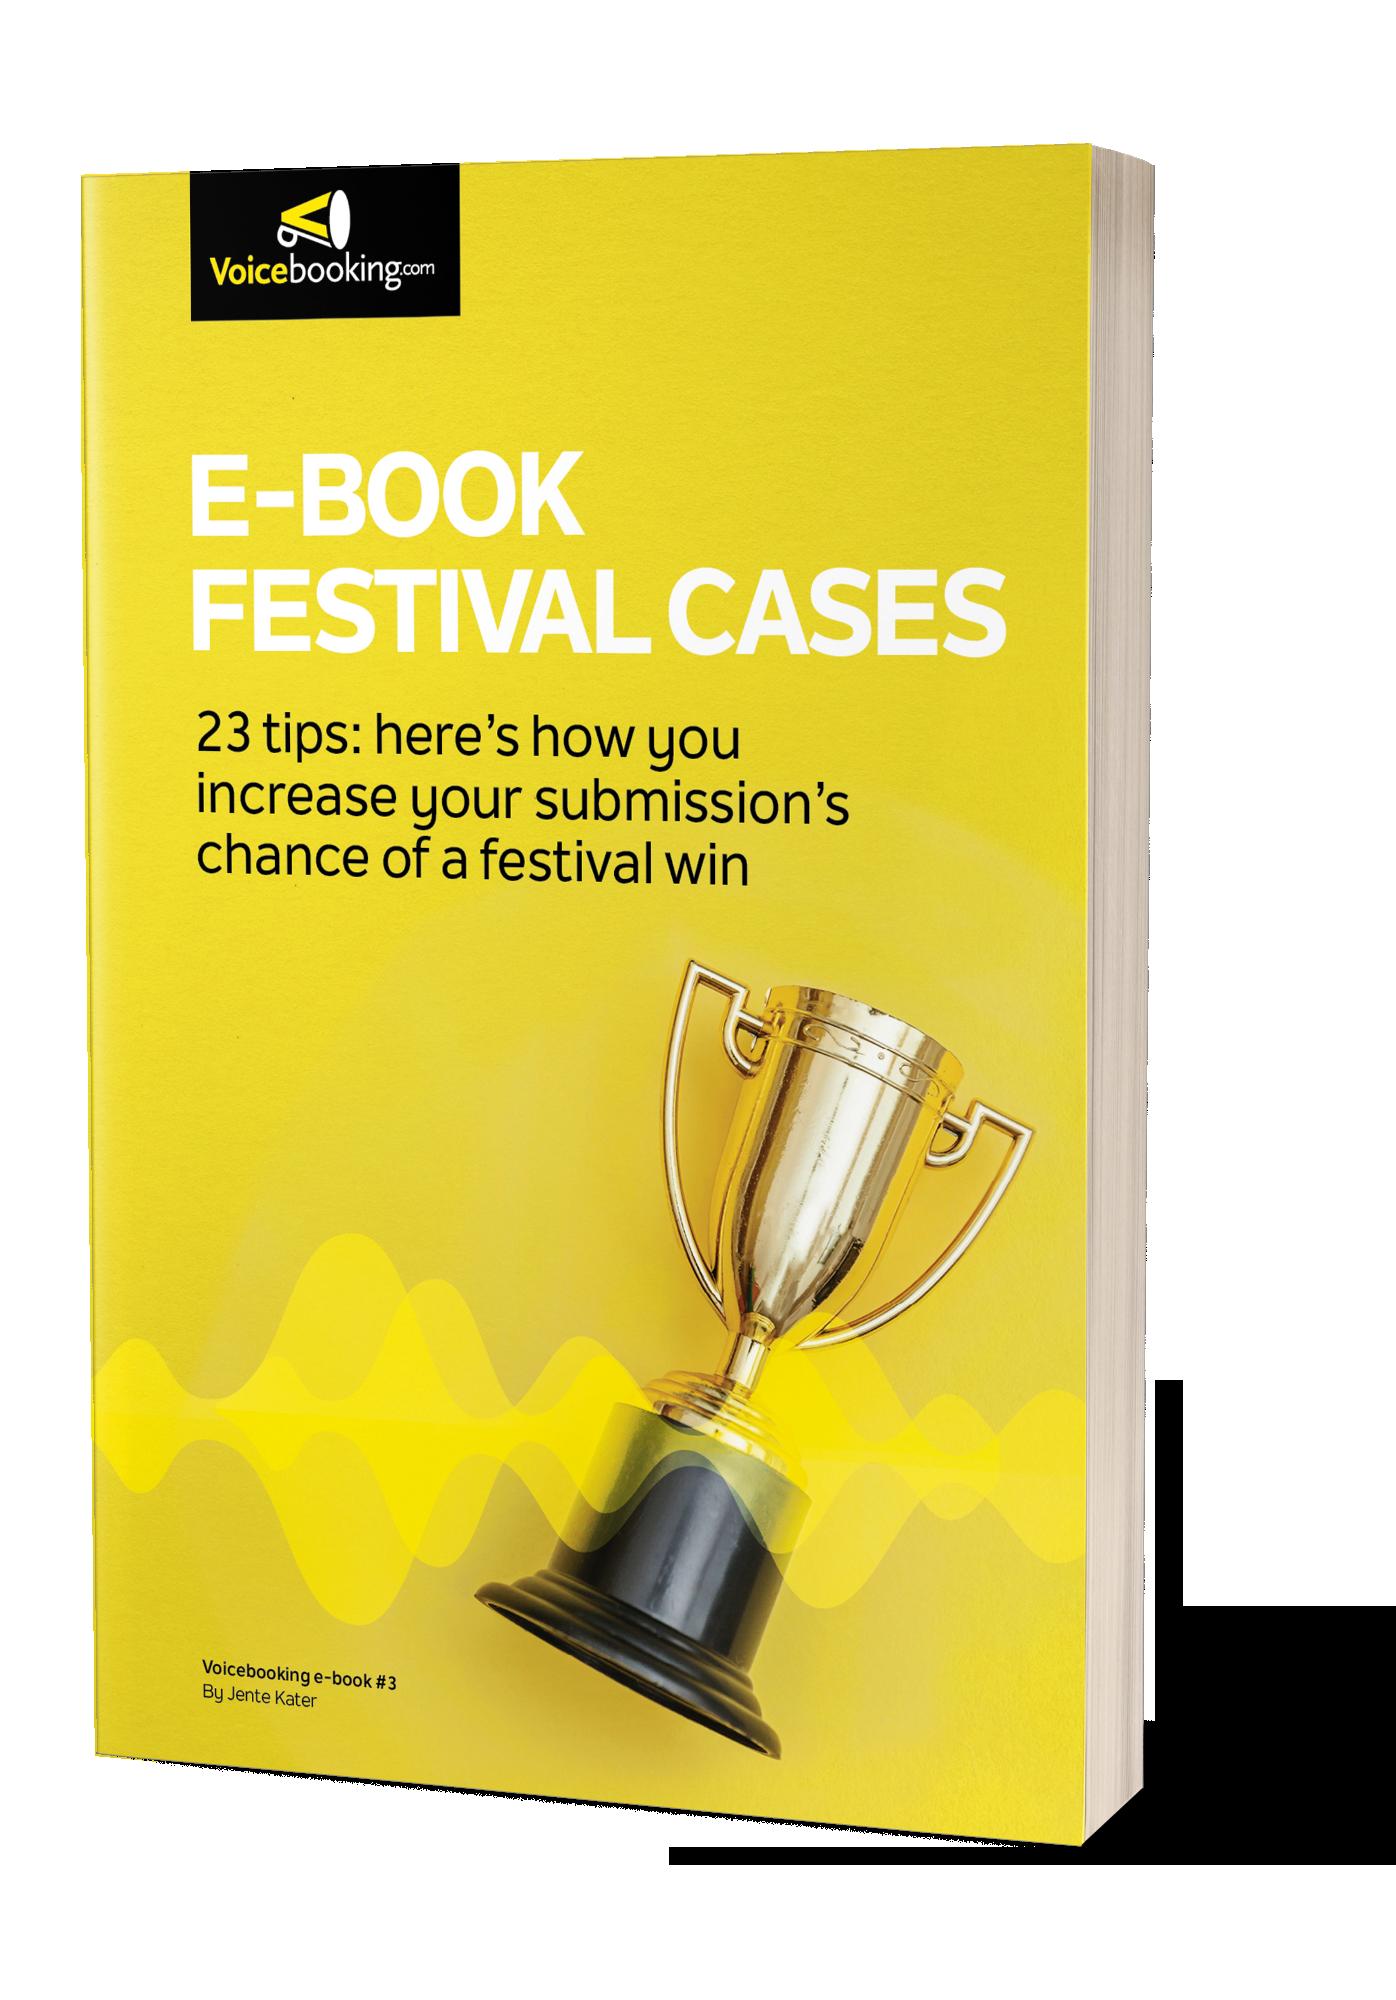 VoiceBooking-Whitepaper-FestivalCases-DEF-ENG